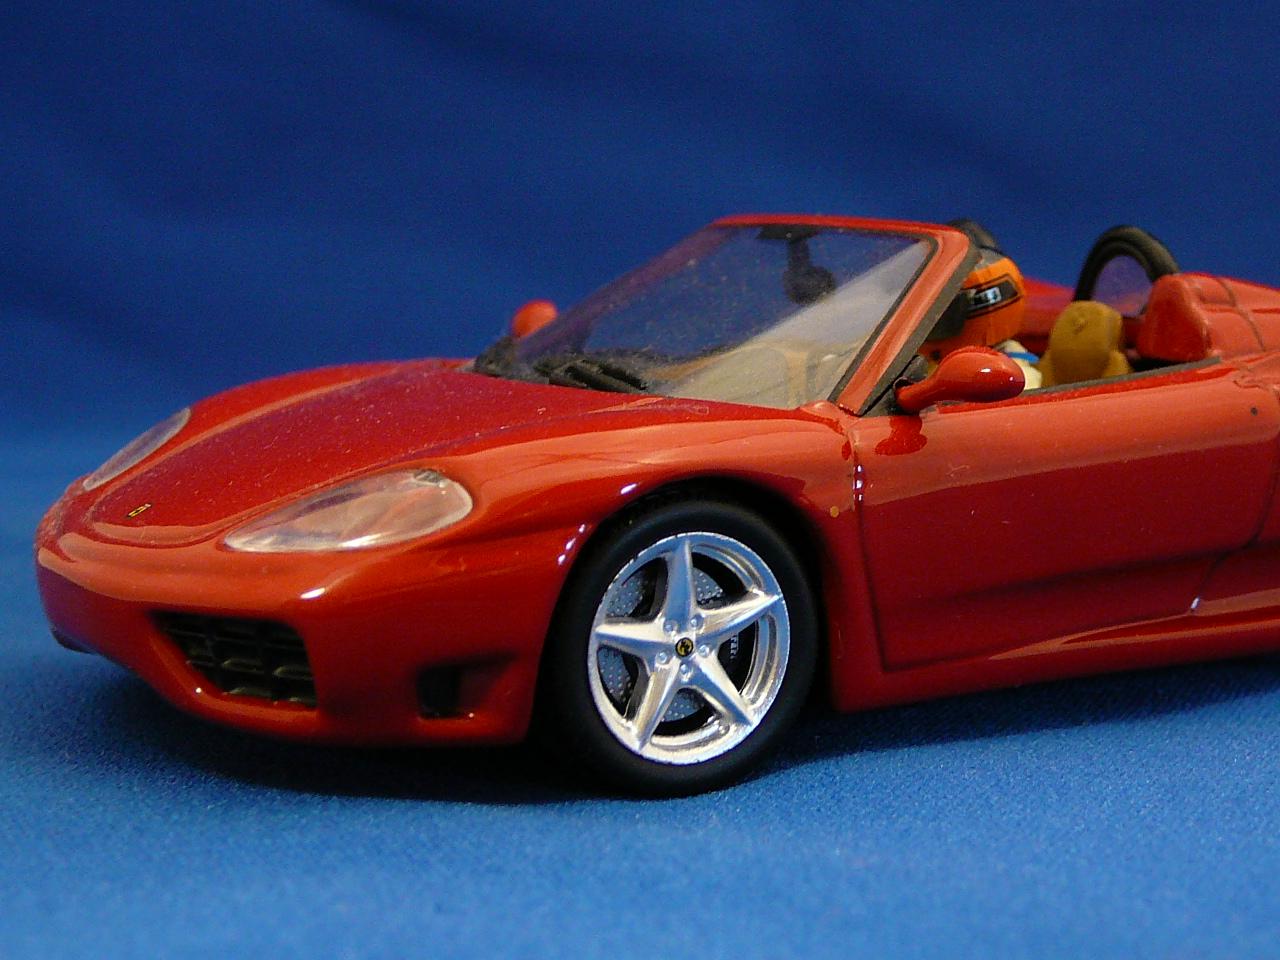 IXO Ferrari F360 Spider